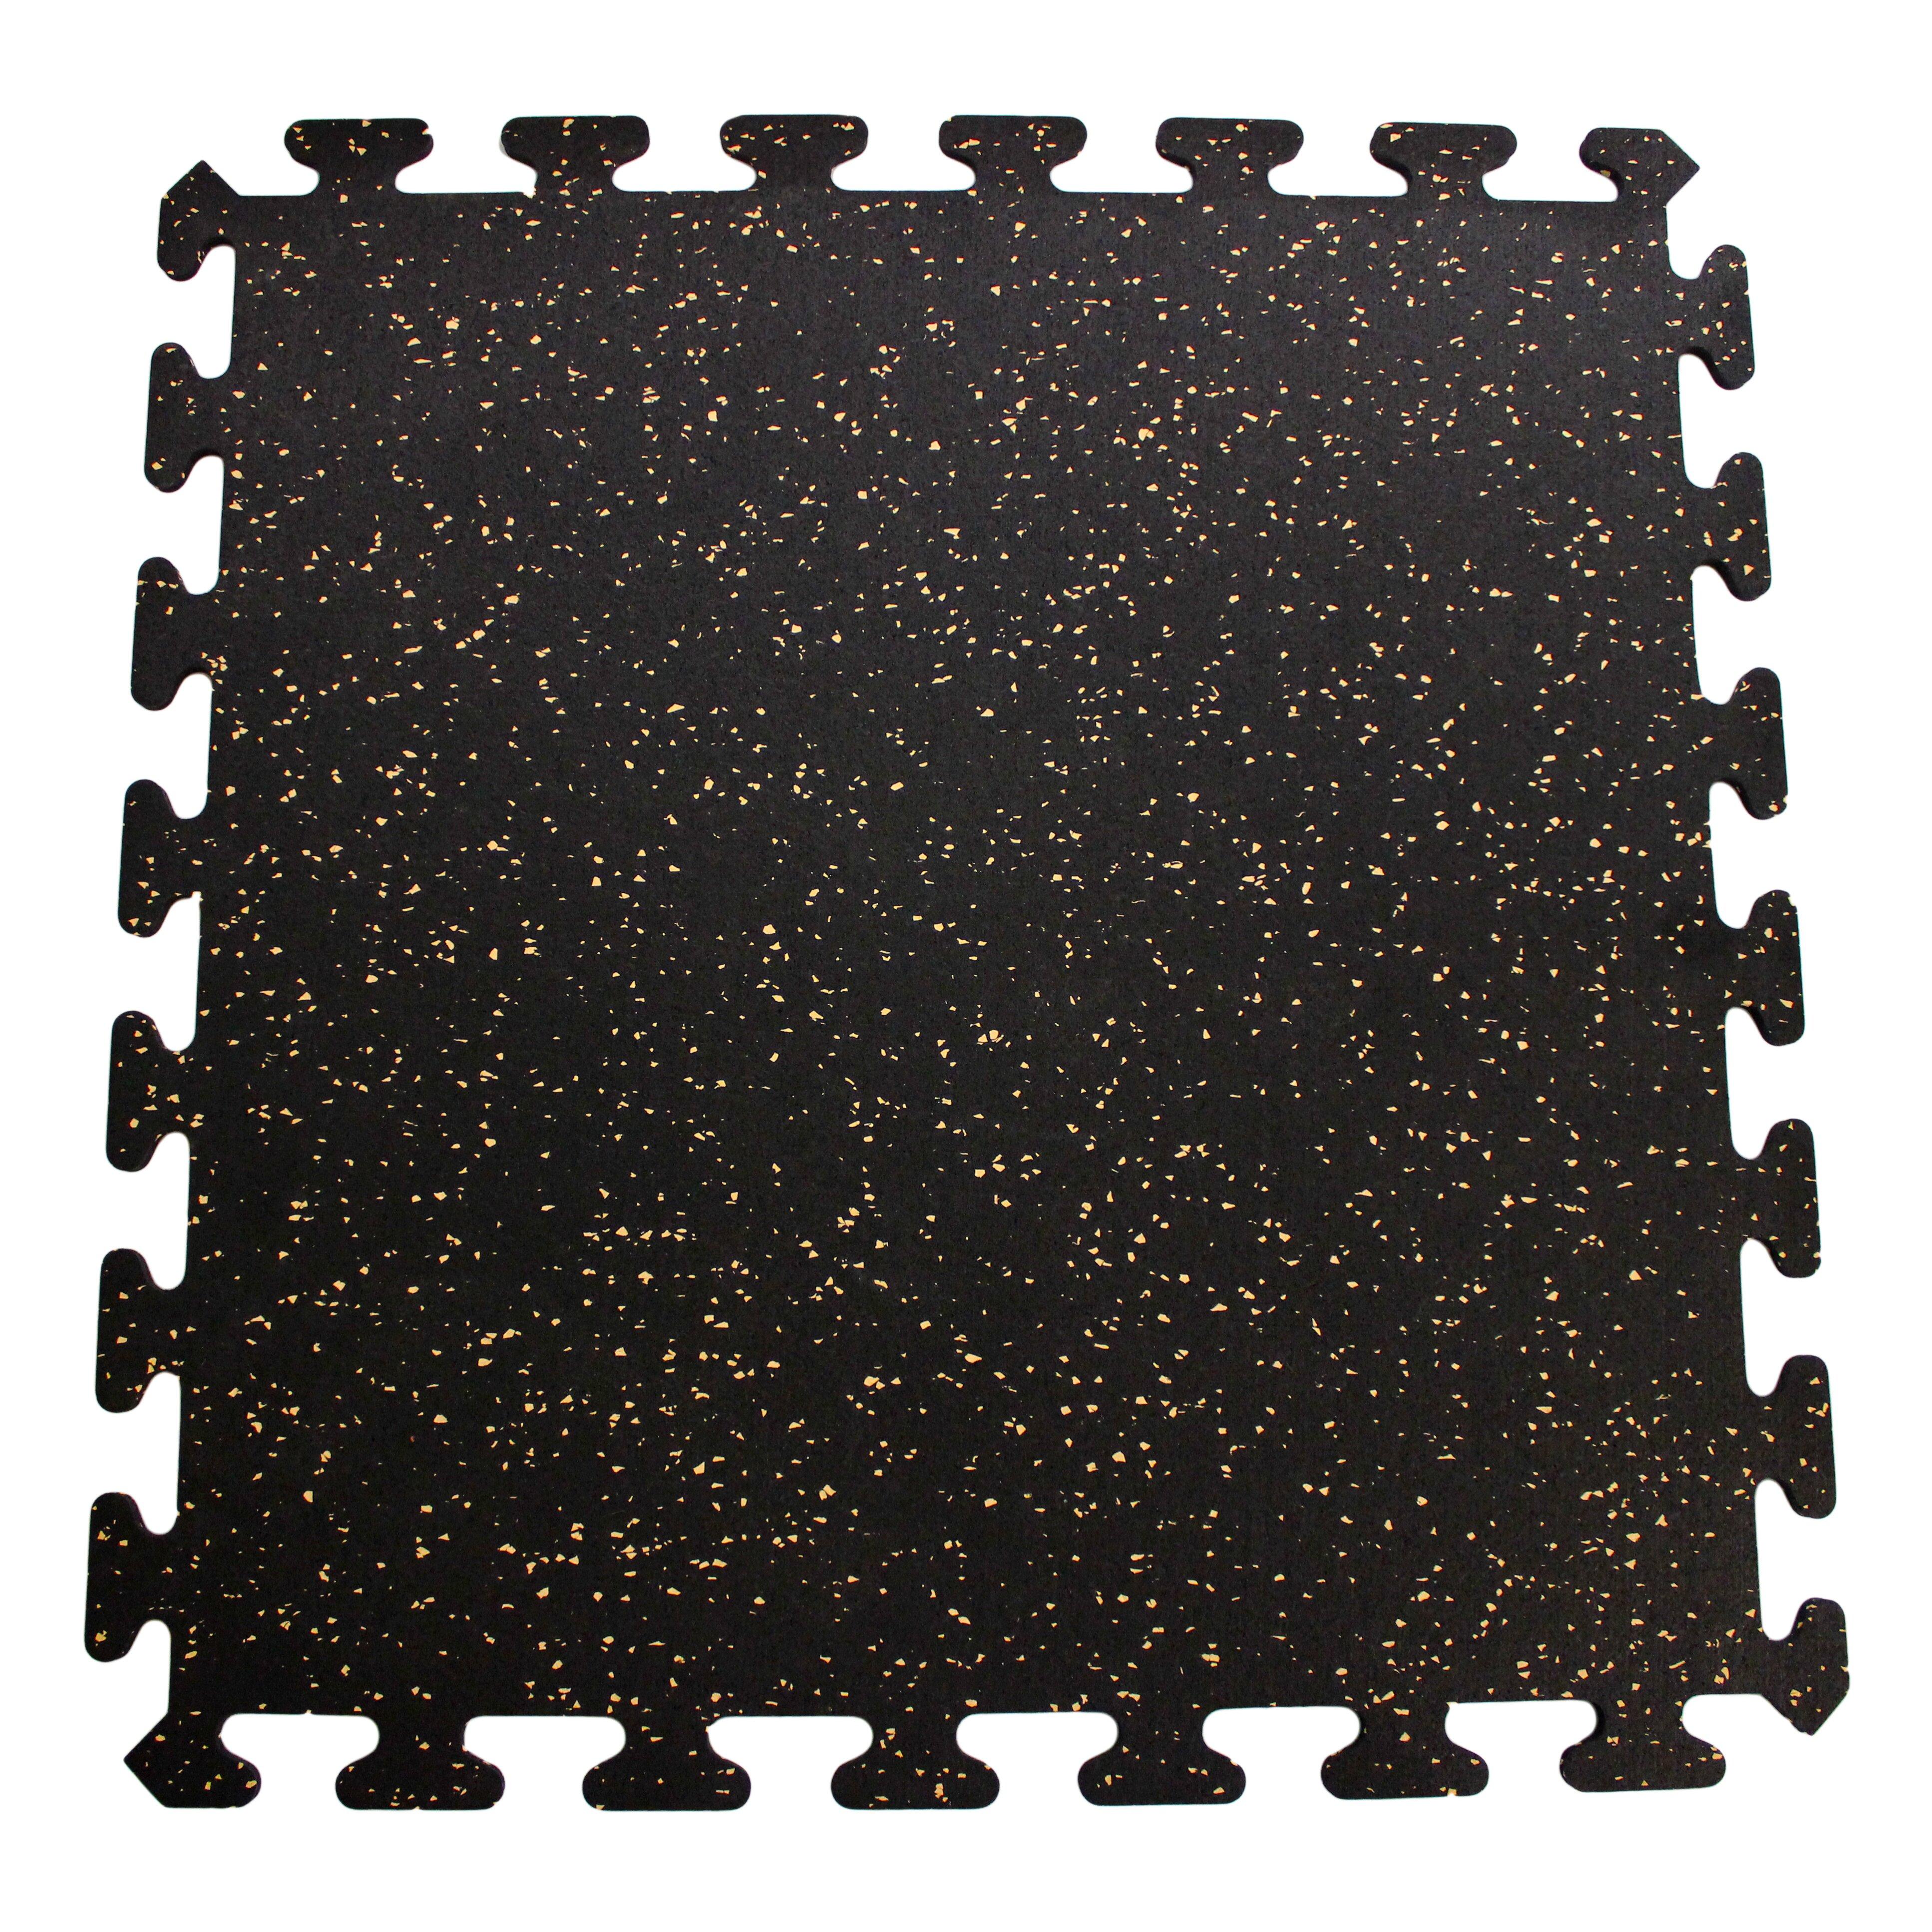 Mats Inc. Interlocking Floor Recycled Rubber Tiles